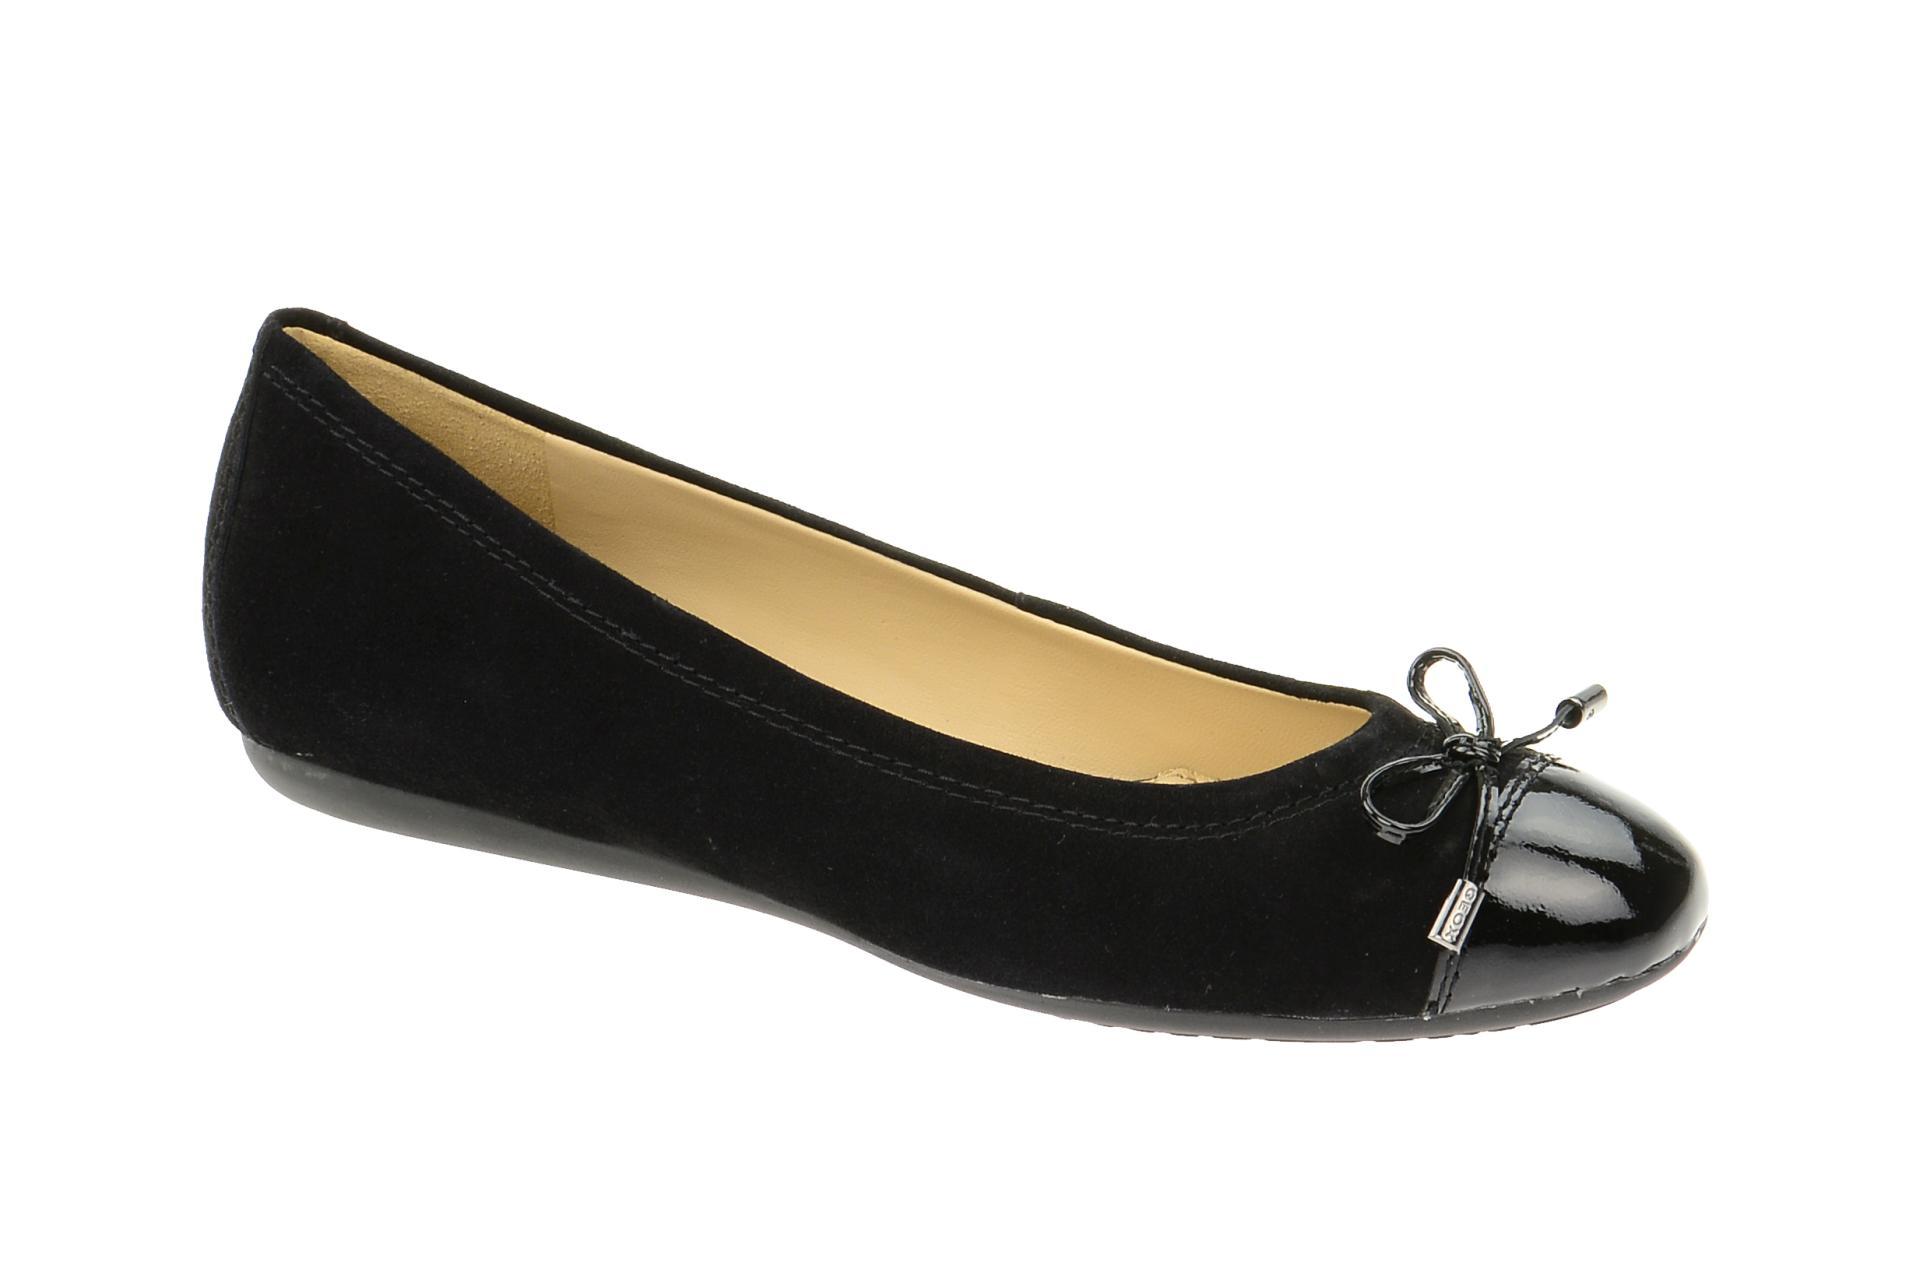 Geox Halbschuhe Schwarz 02166 Damen Ballerinas Schuhe Lola D93m4a N8n0mw